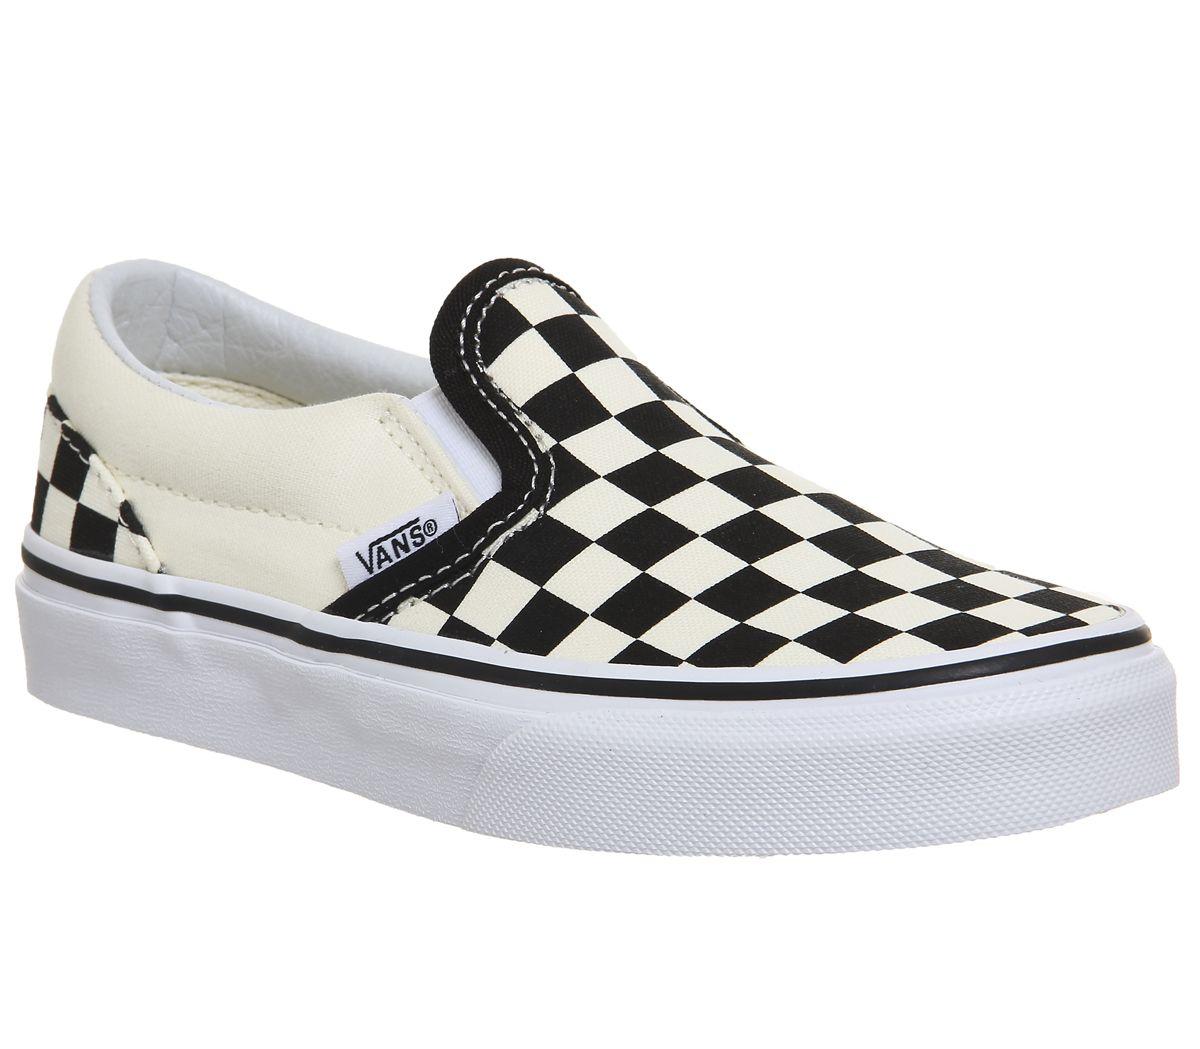 235621952a Vans Classic Slip On Kids Black White Checkerboard - Unisex